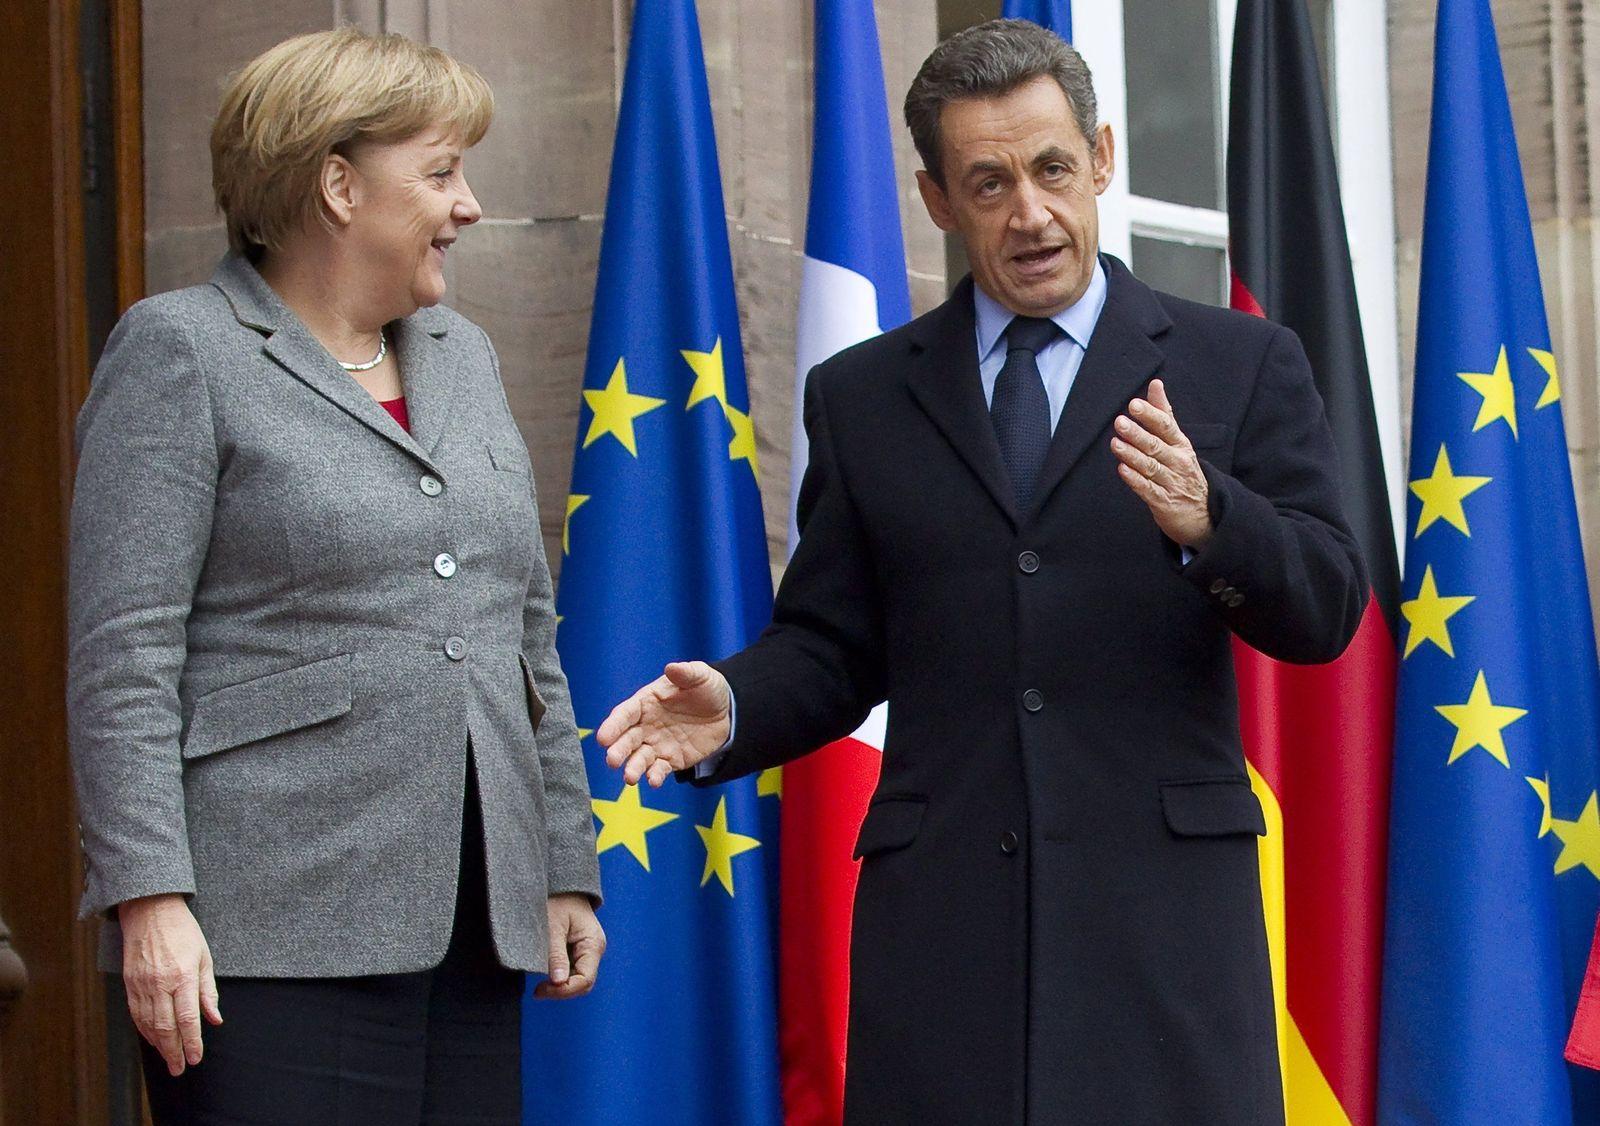 Sarkozy/ Merkel